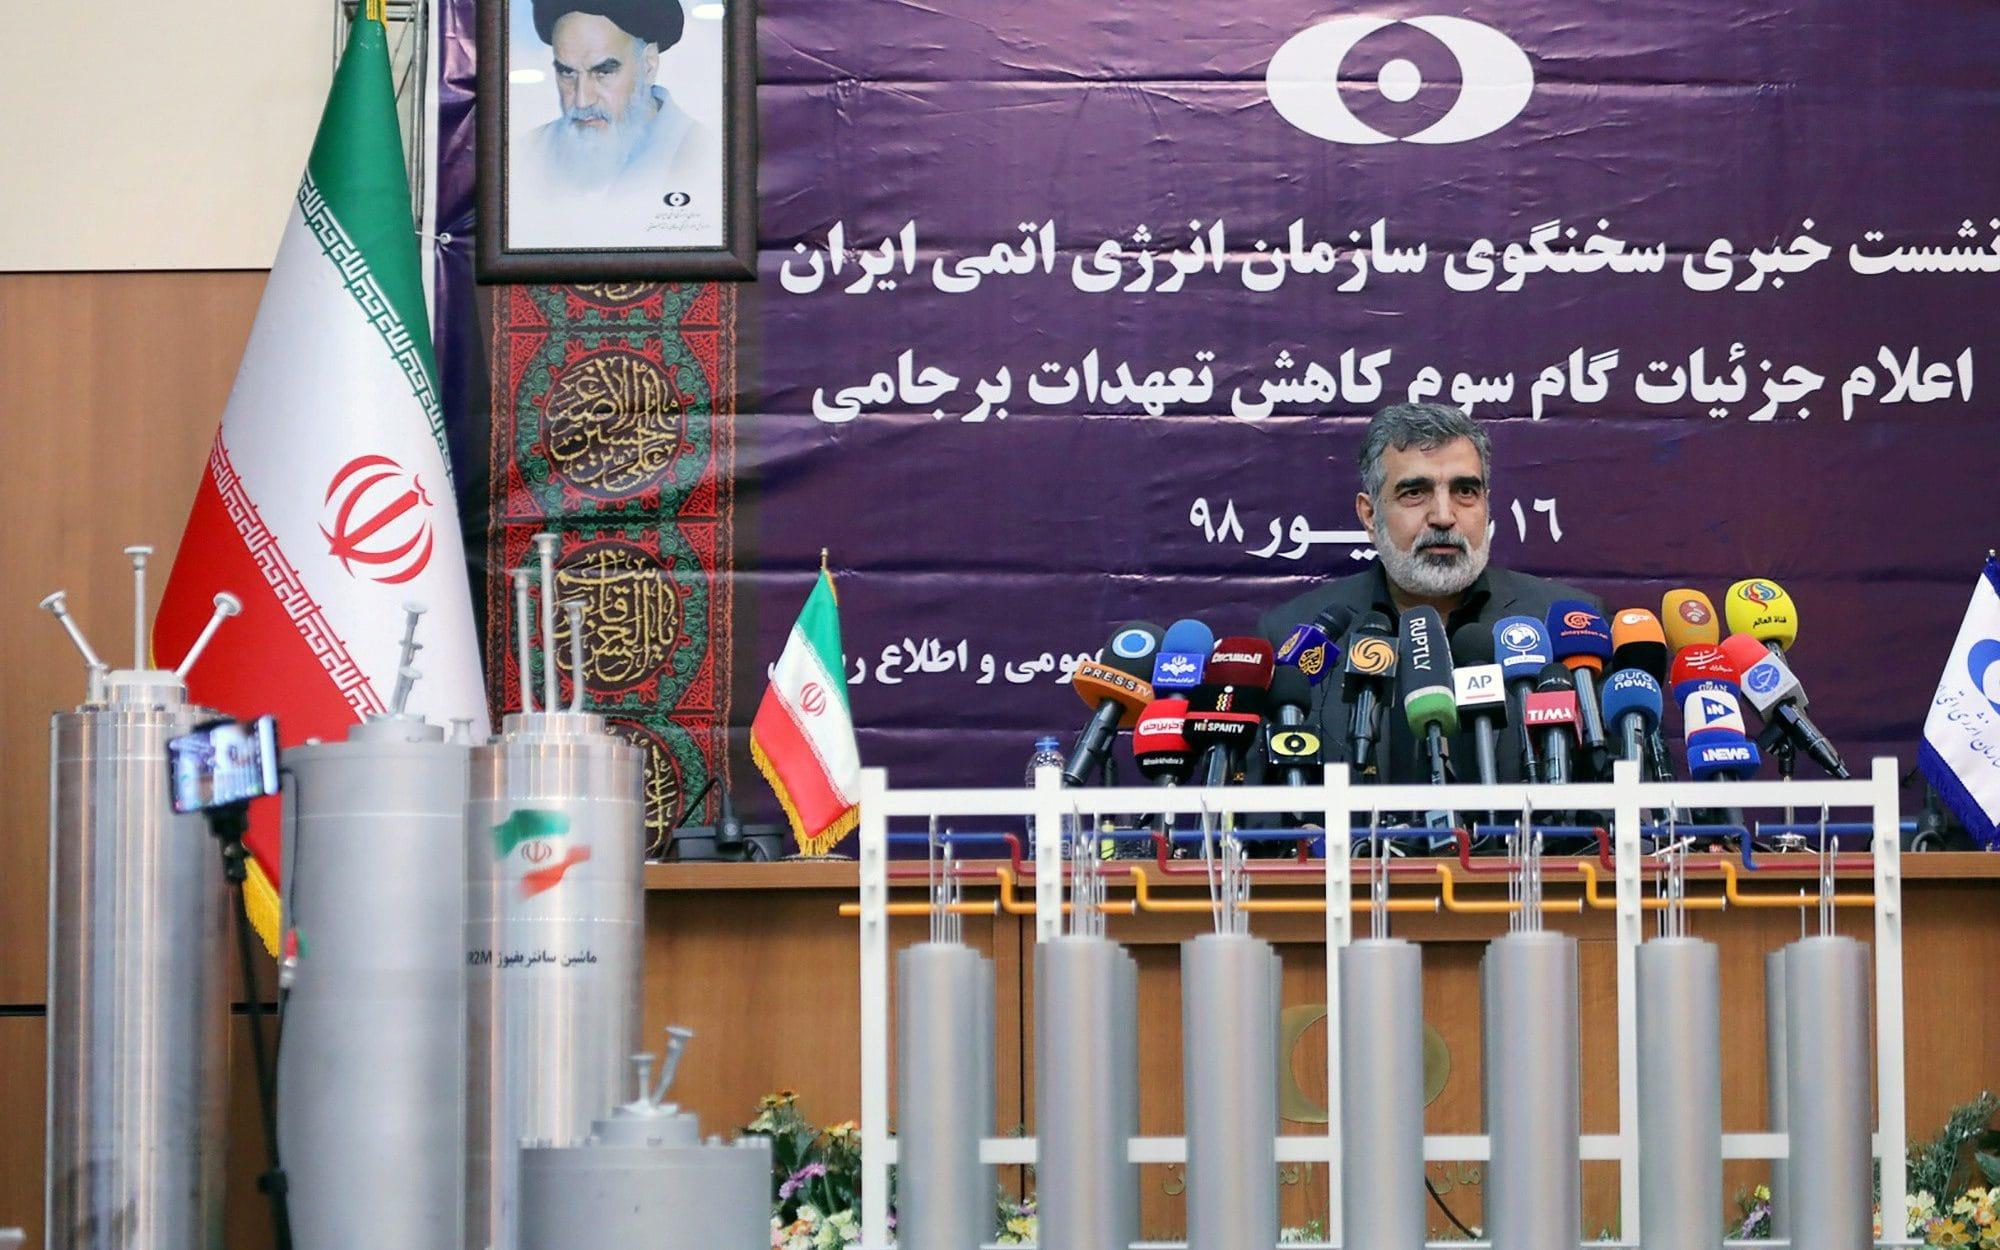 Iran speeds up uranium enrichment in latest breach of nuclear deal